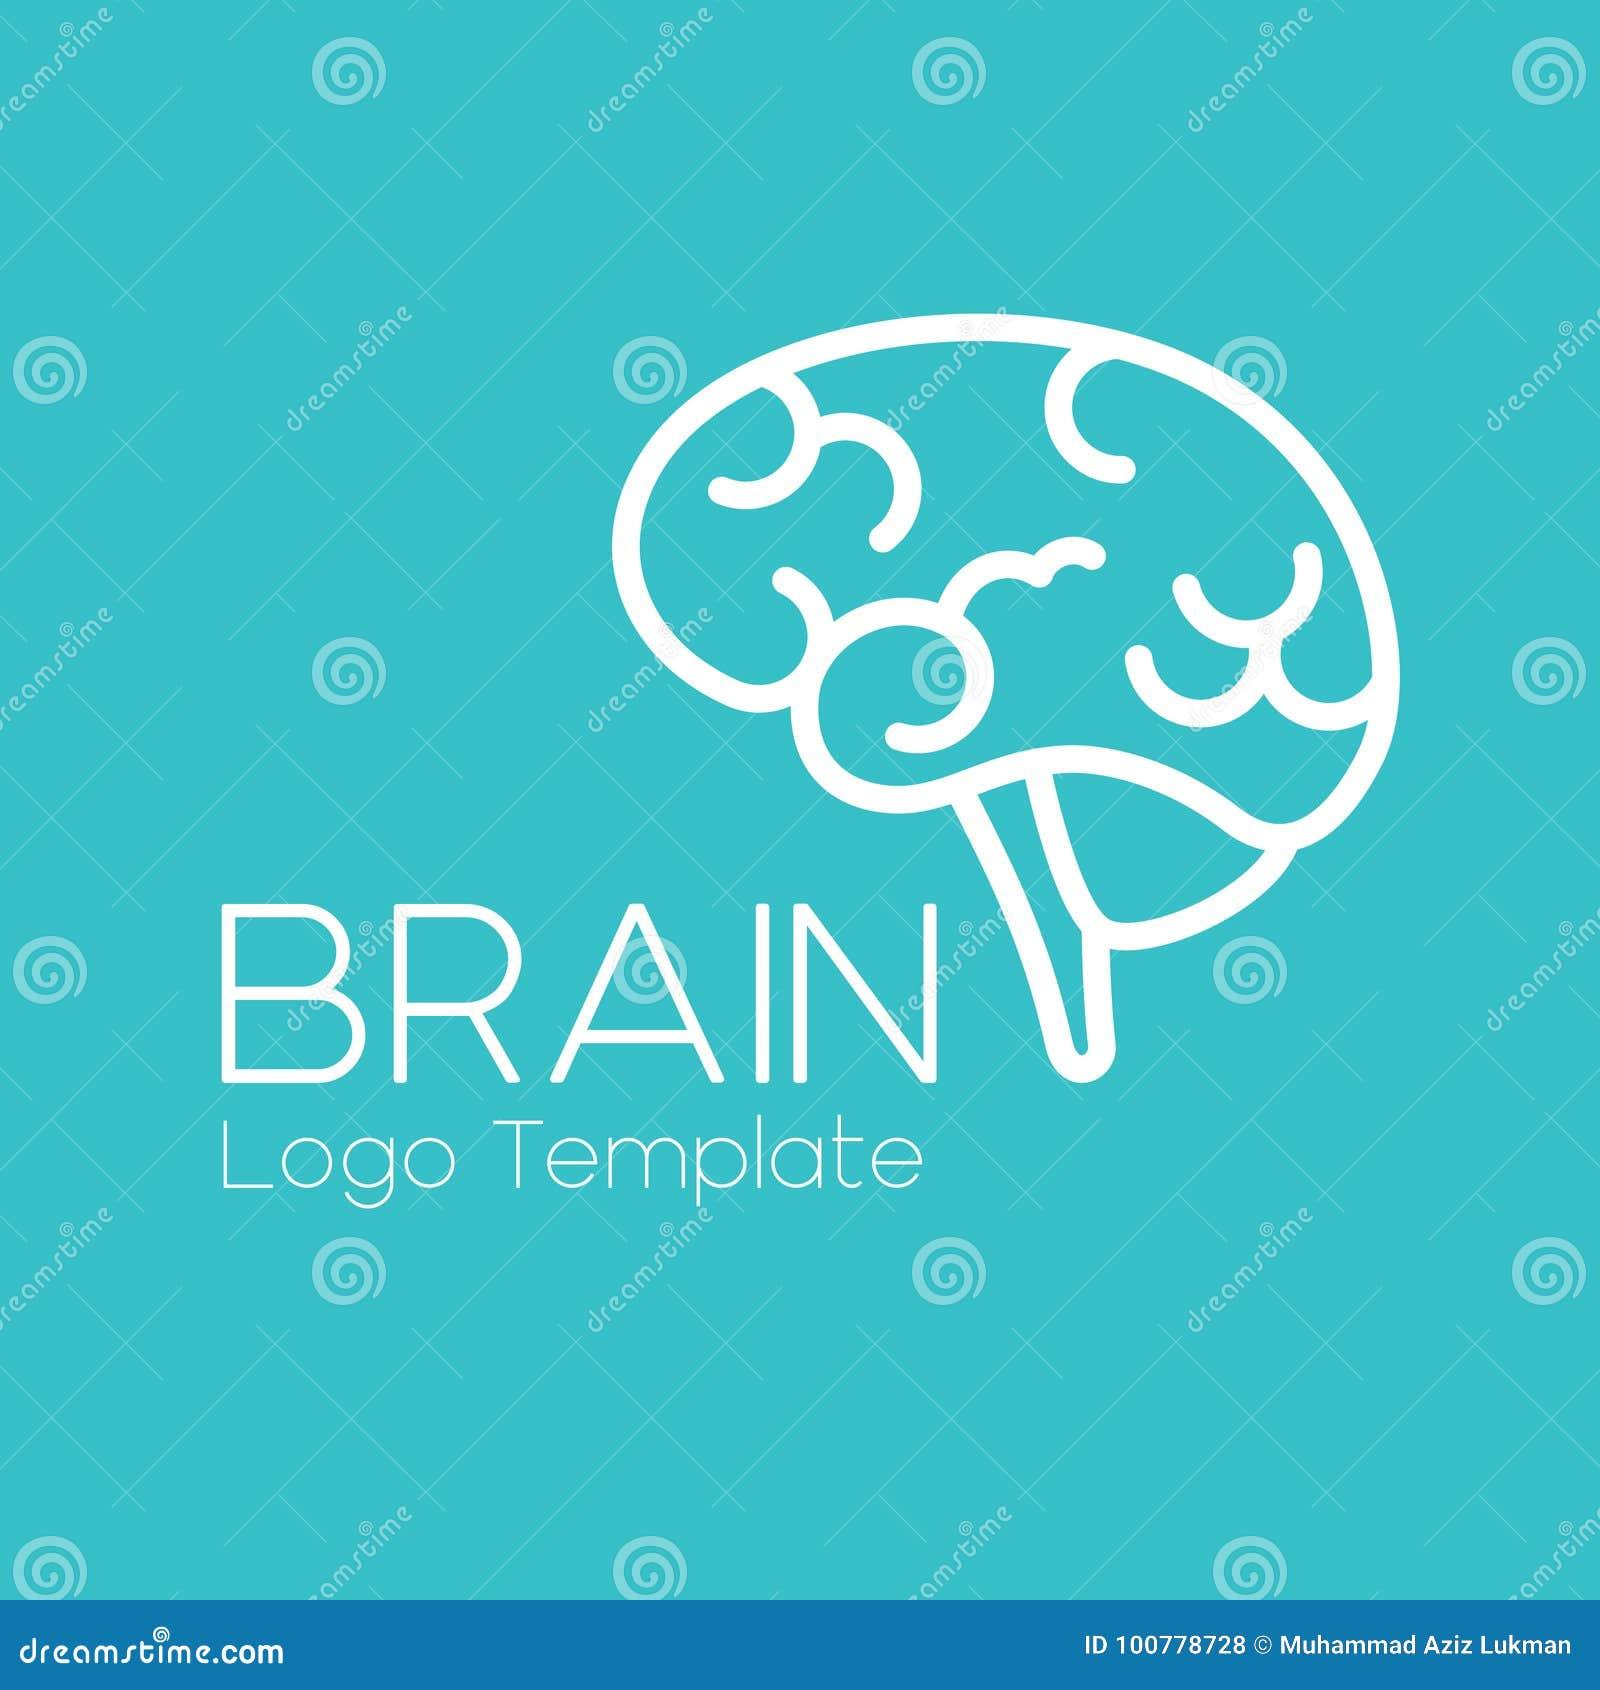 Vector Brain logo template